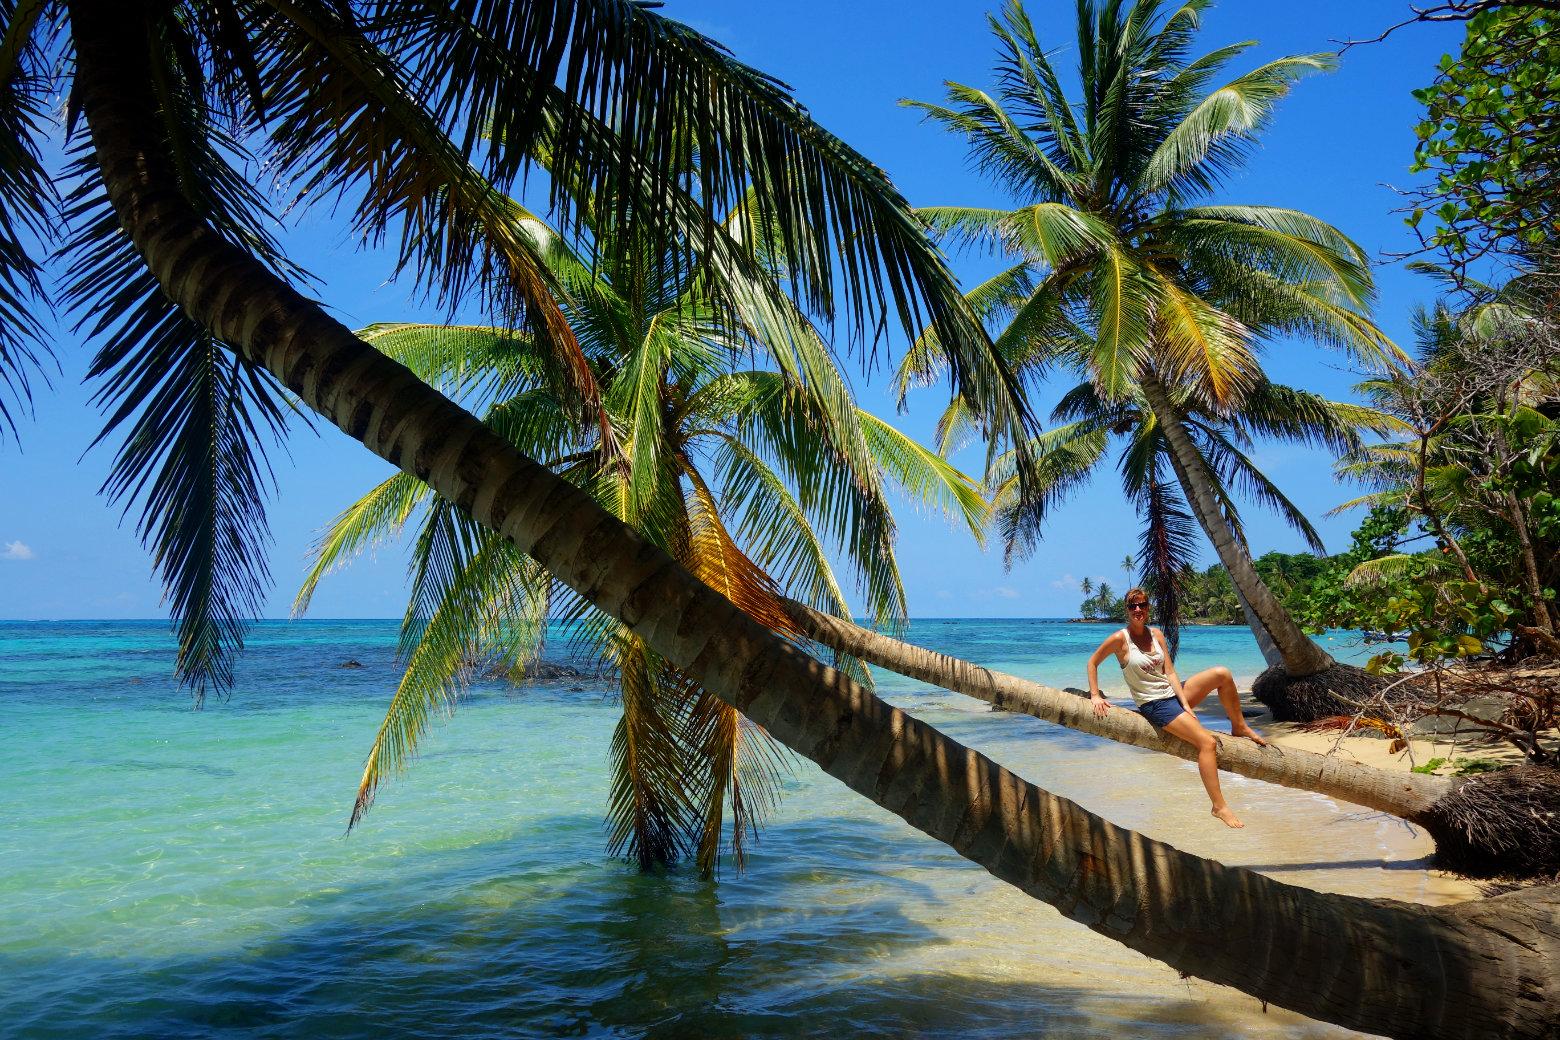 Nicaragua Little Corn Island Palmen und Meer